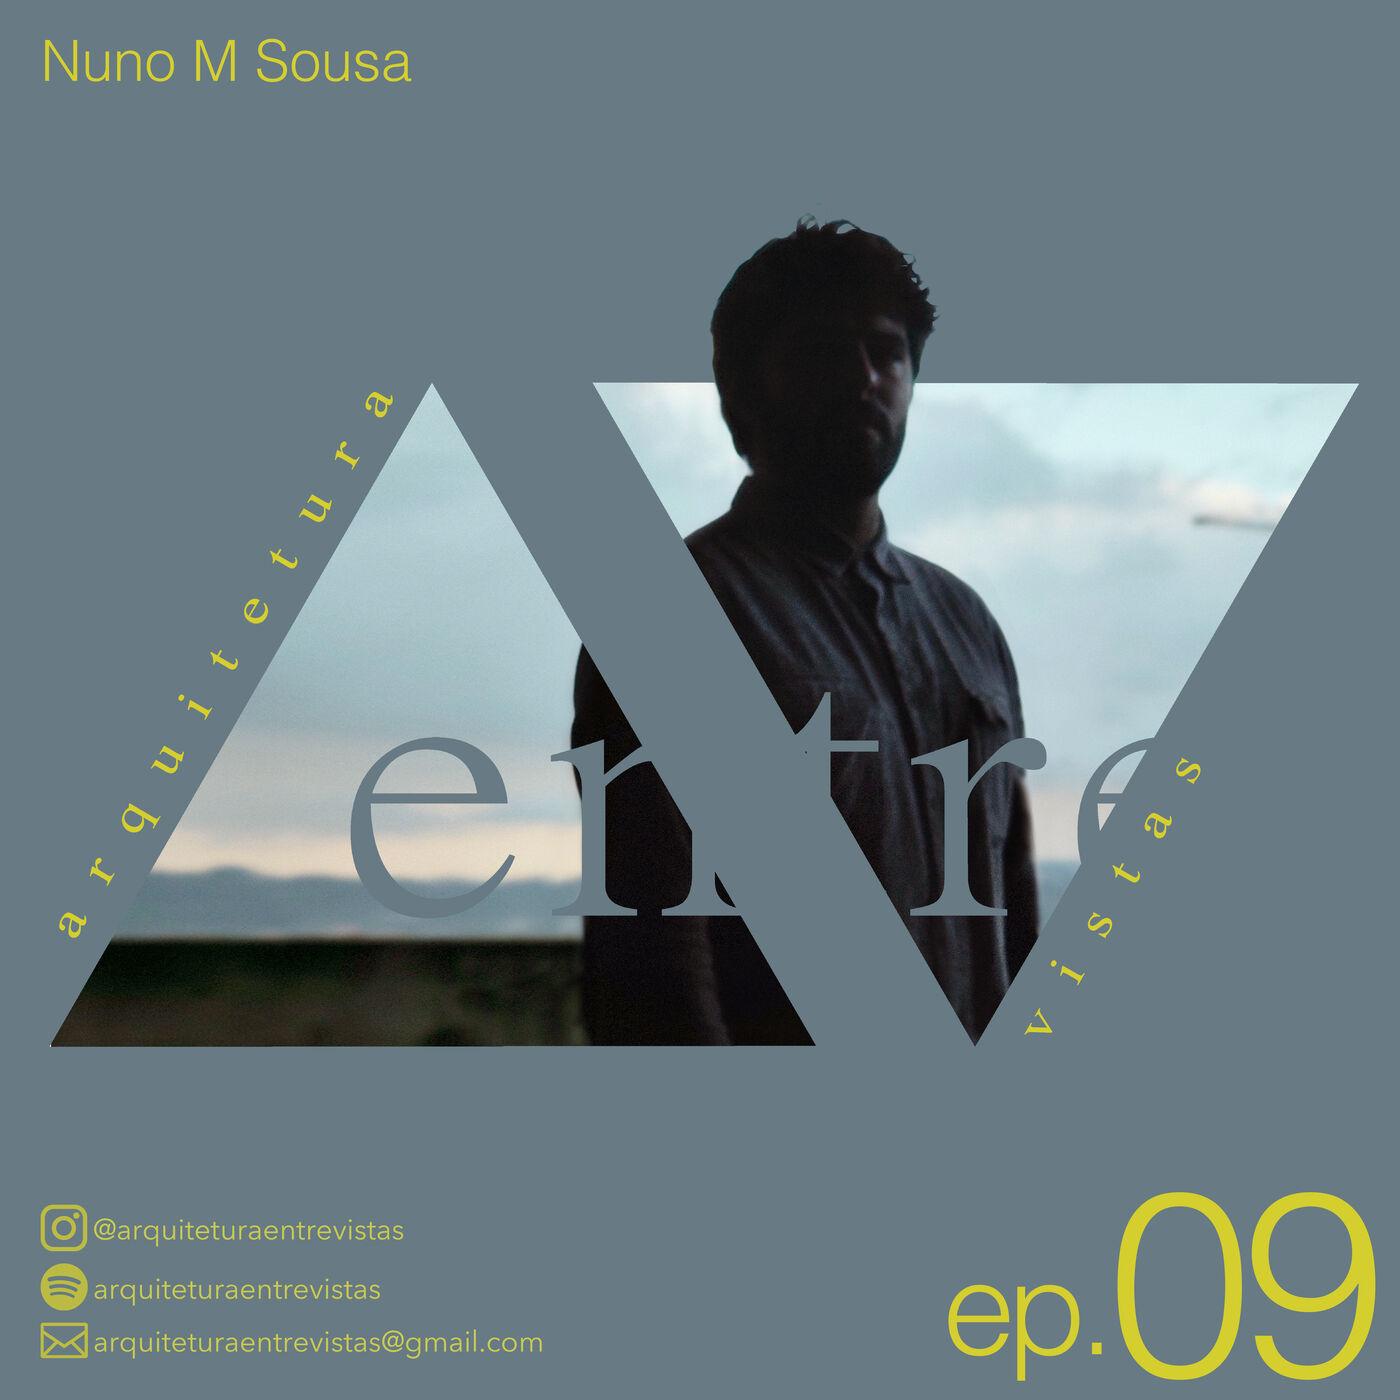 EP.9 Nuno M Sousa, Arquitetura Entre Vistas